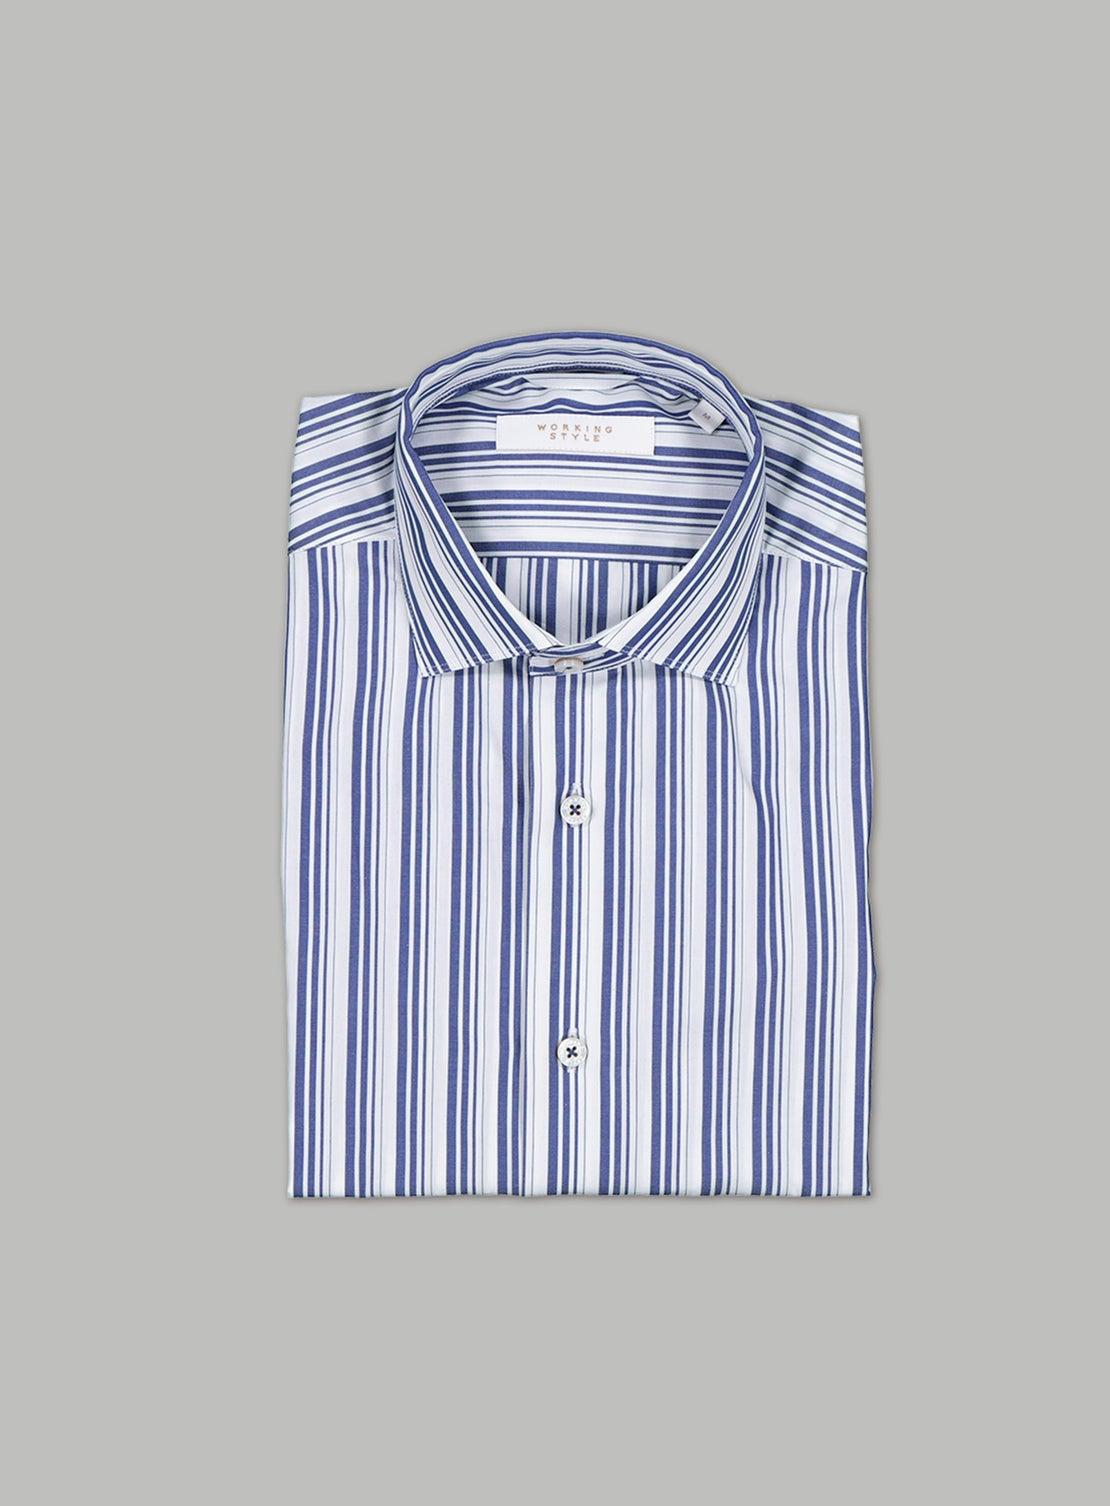 Blue & White Abstract Stripe Shirt